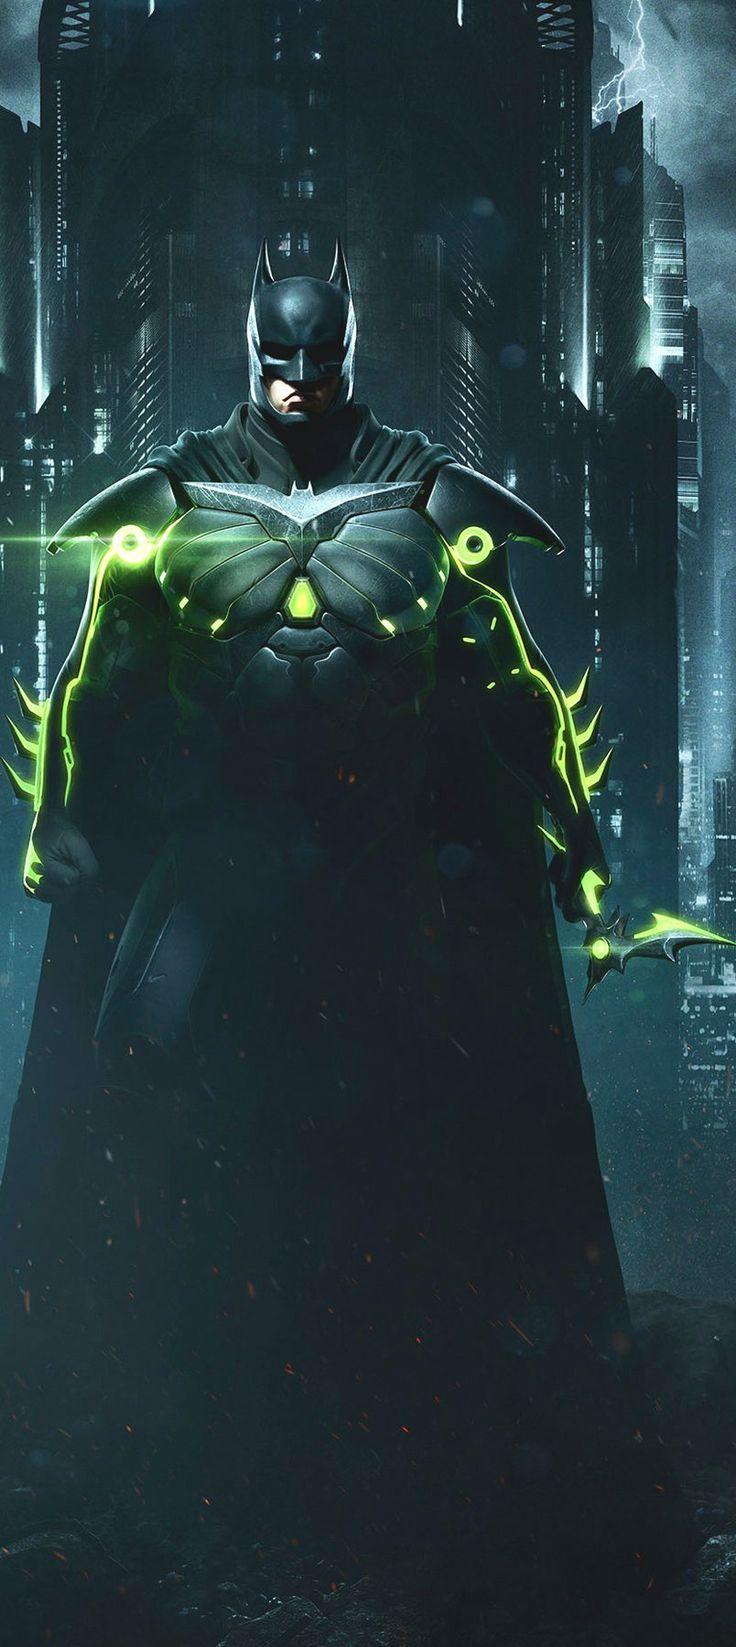 BATMAN-AWESOMENESS-injustice-game-art-DC-comics-wallpaper-wp3003496